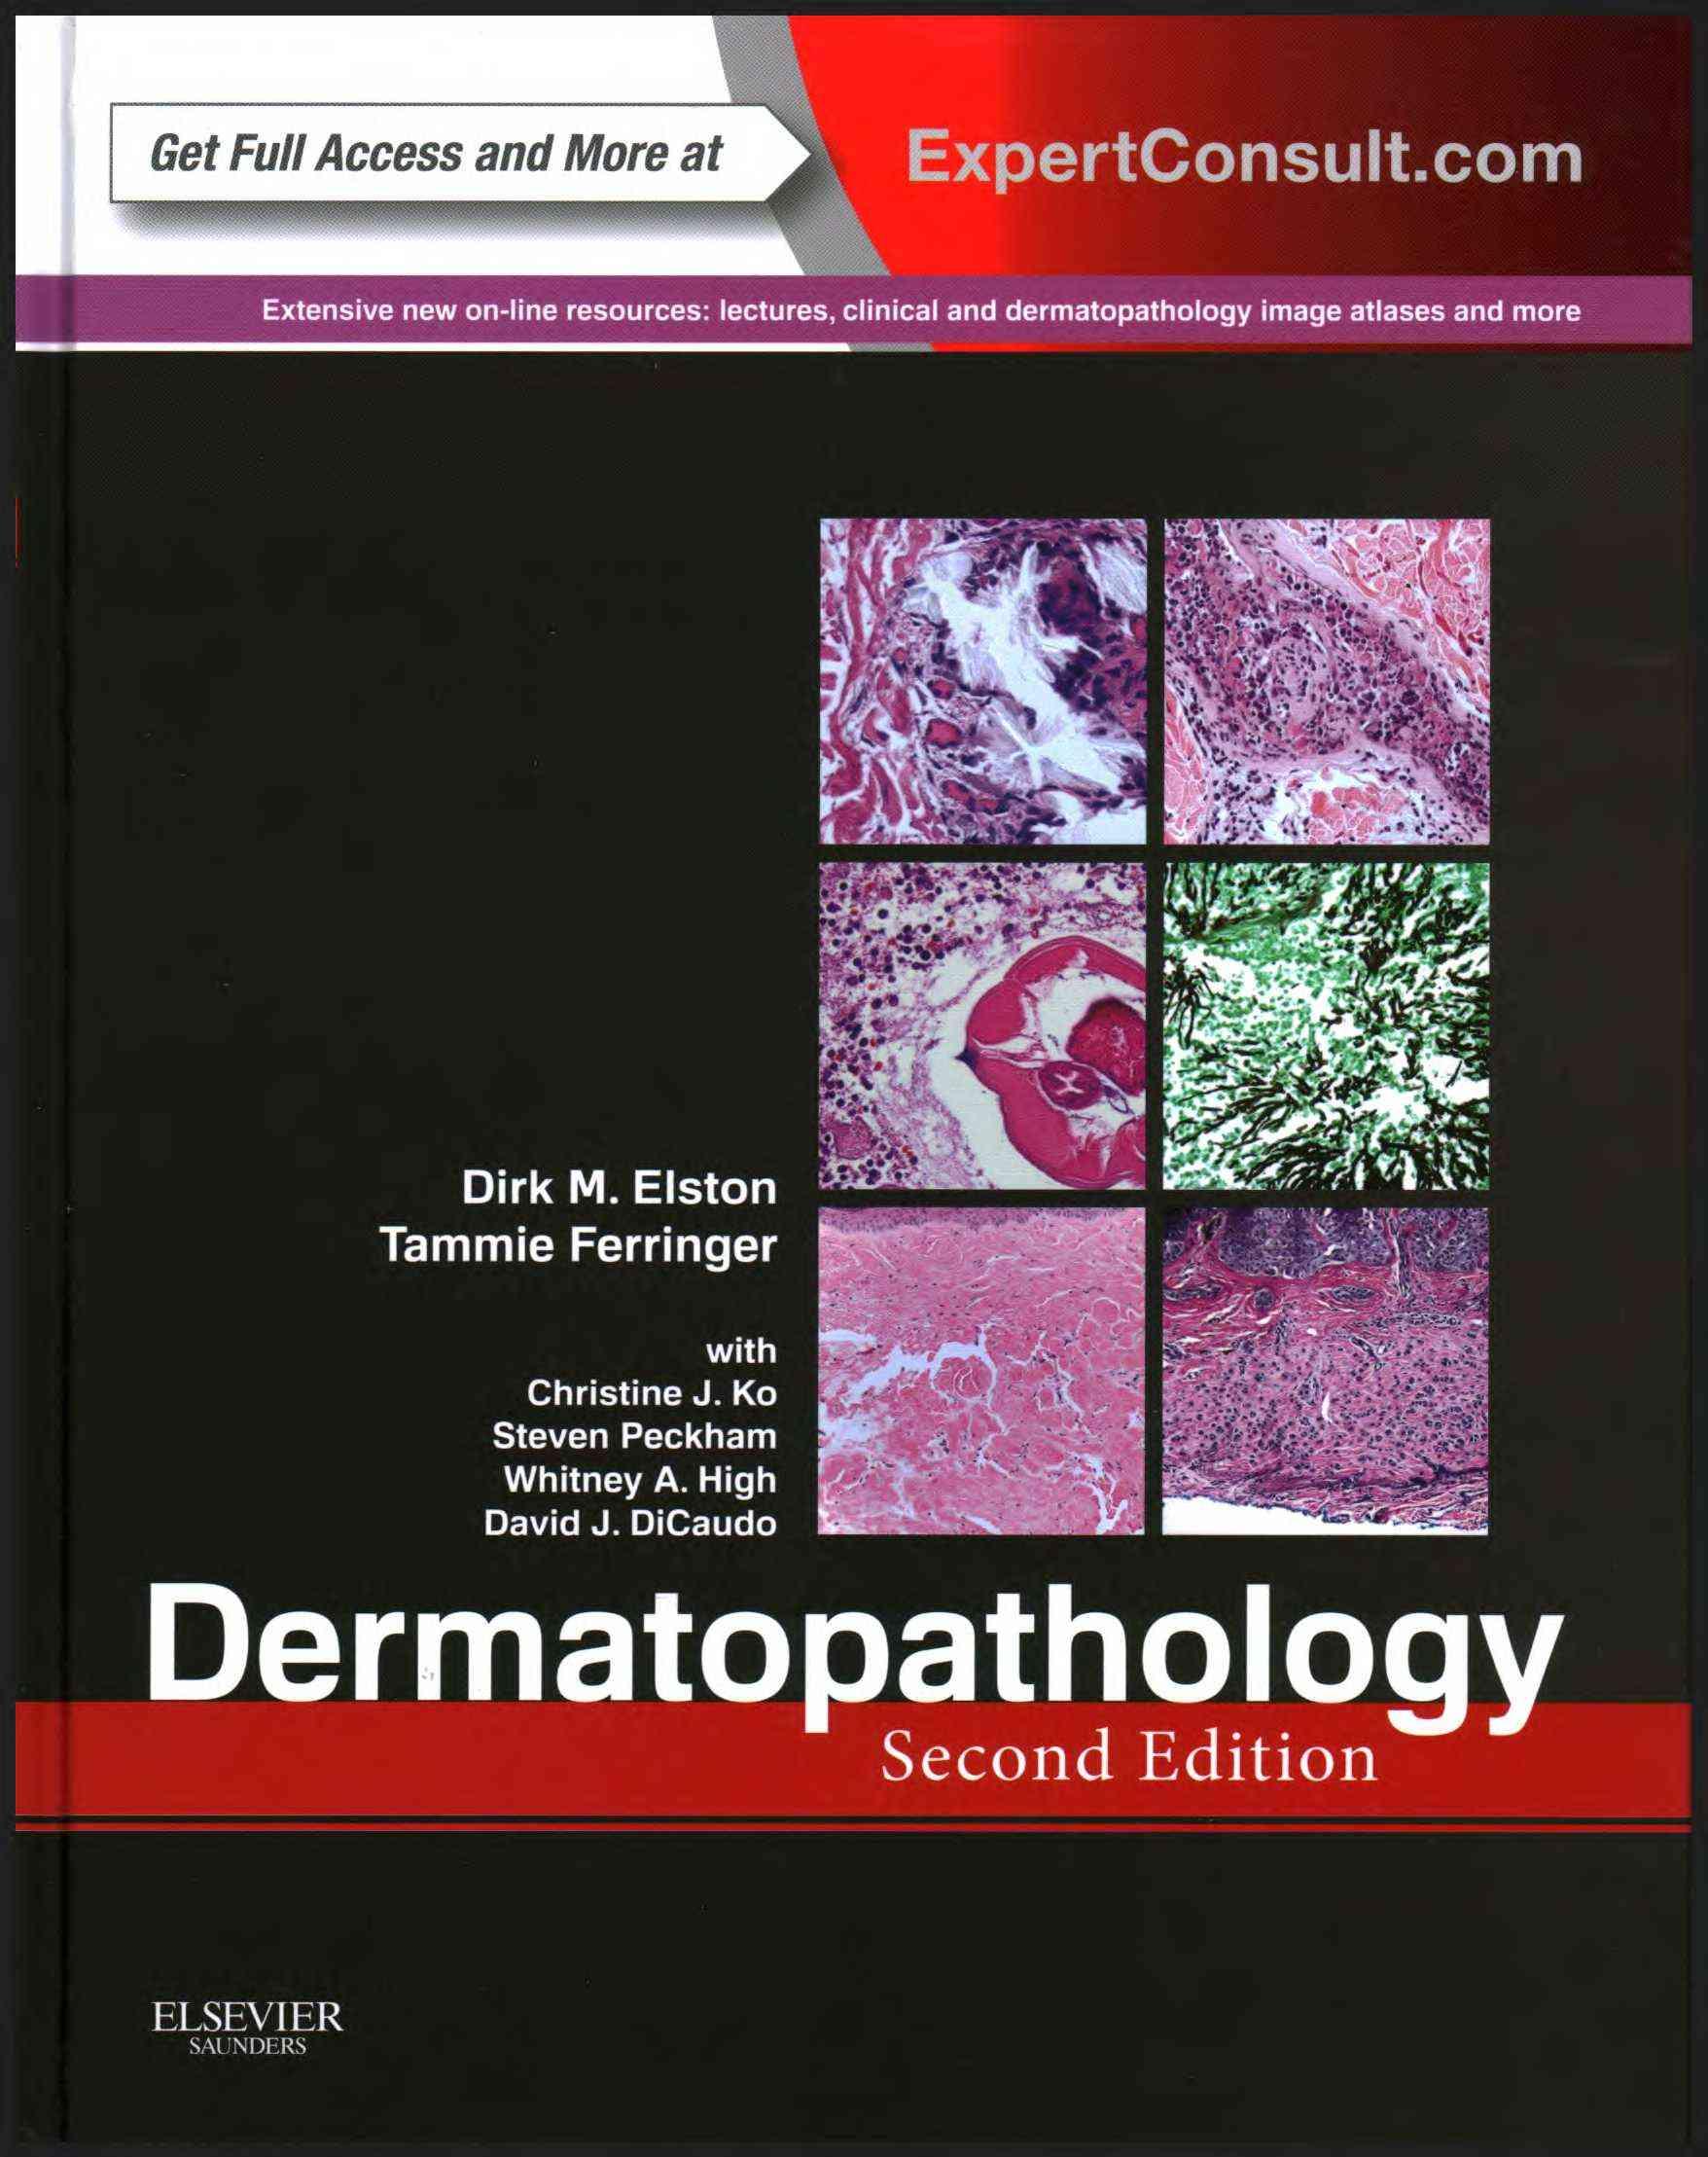 Dermatopathology By Elston, Dirk/ Ferringer, Tammie/ Peckham, Steven/ High, Whitney A./ DiCaudo, David J.